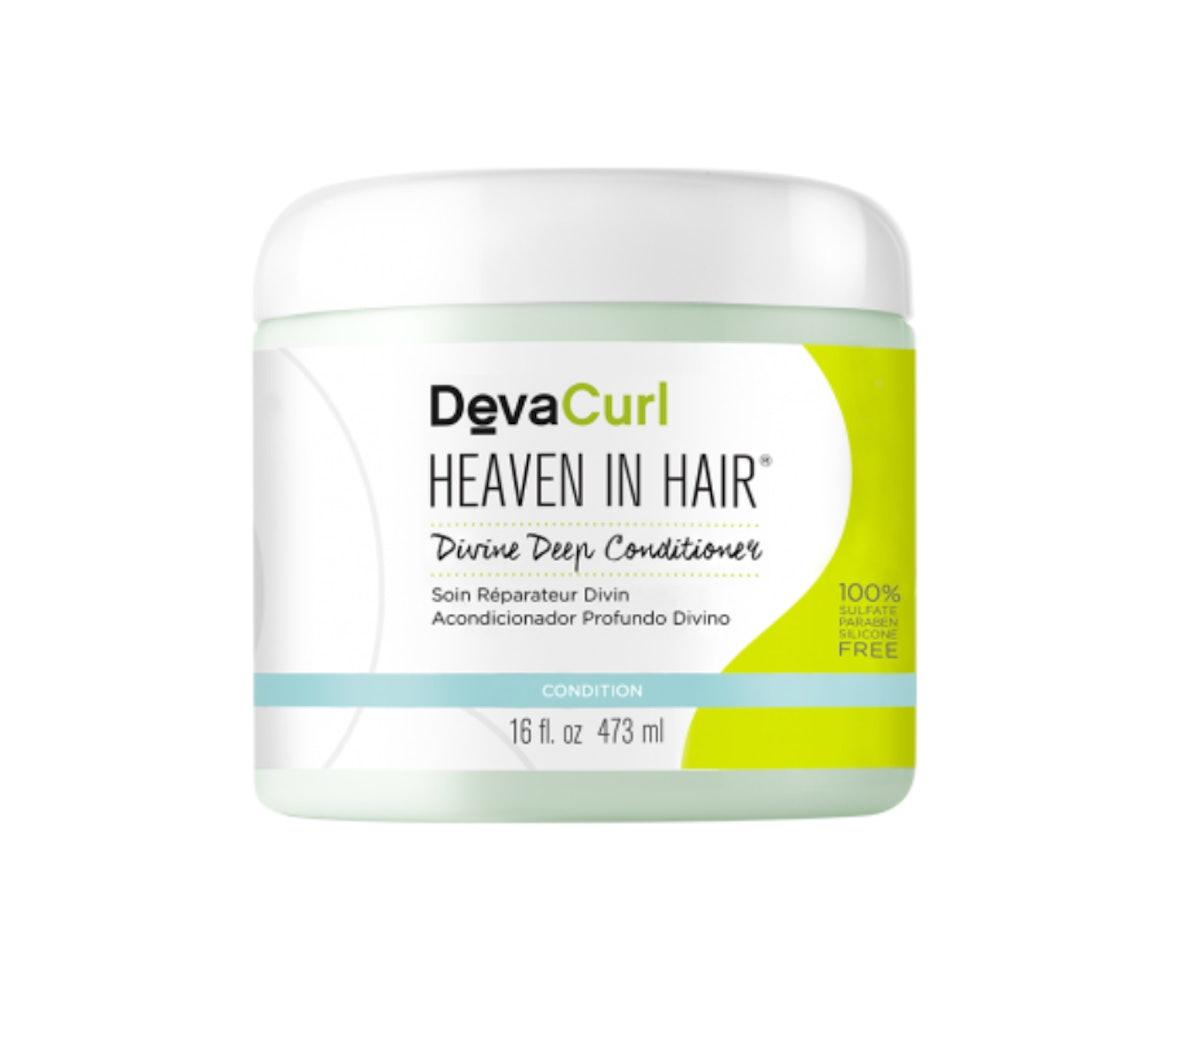 Heaven In Hair - 16 oz.